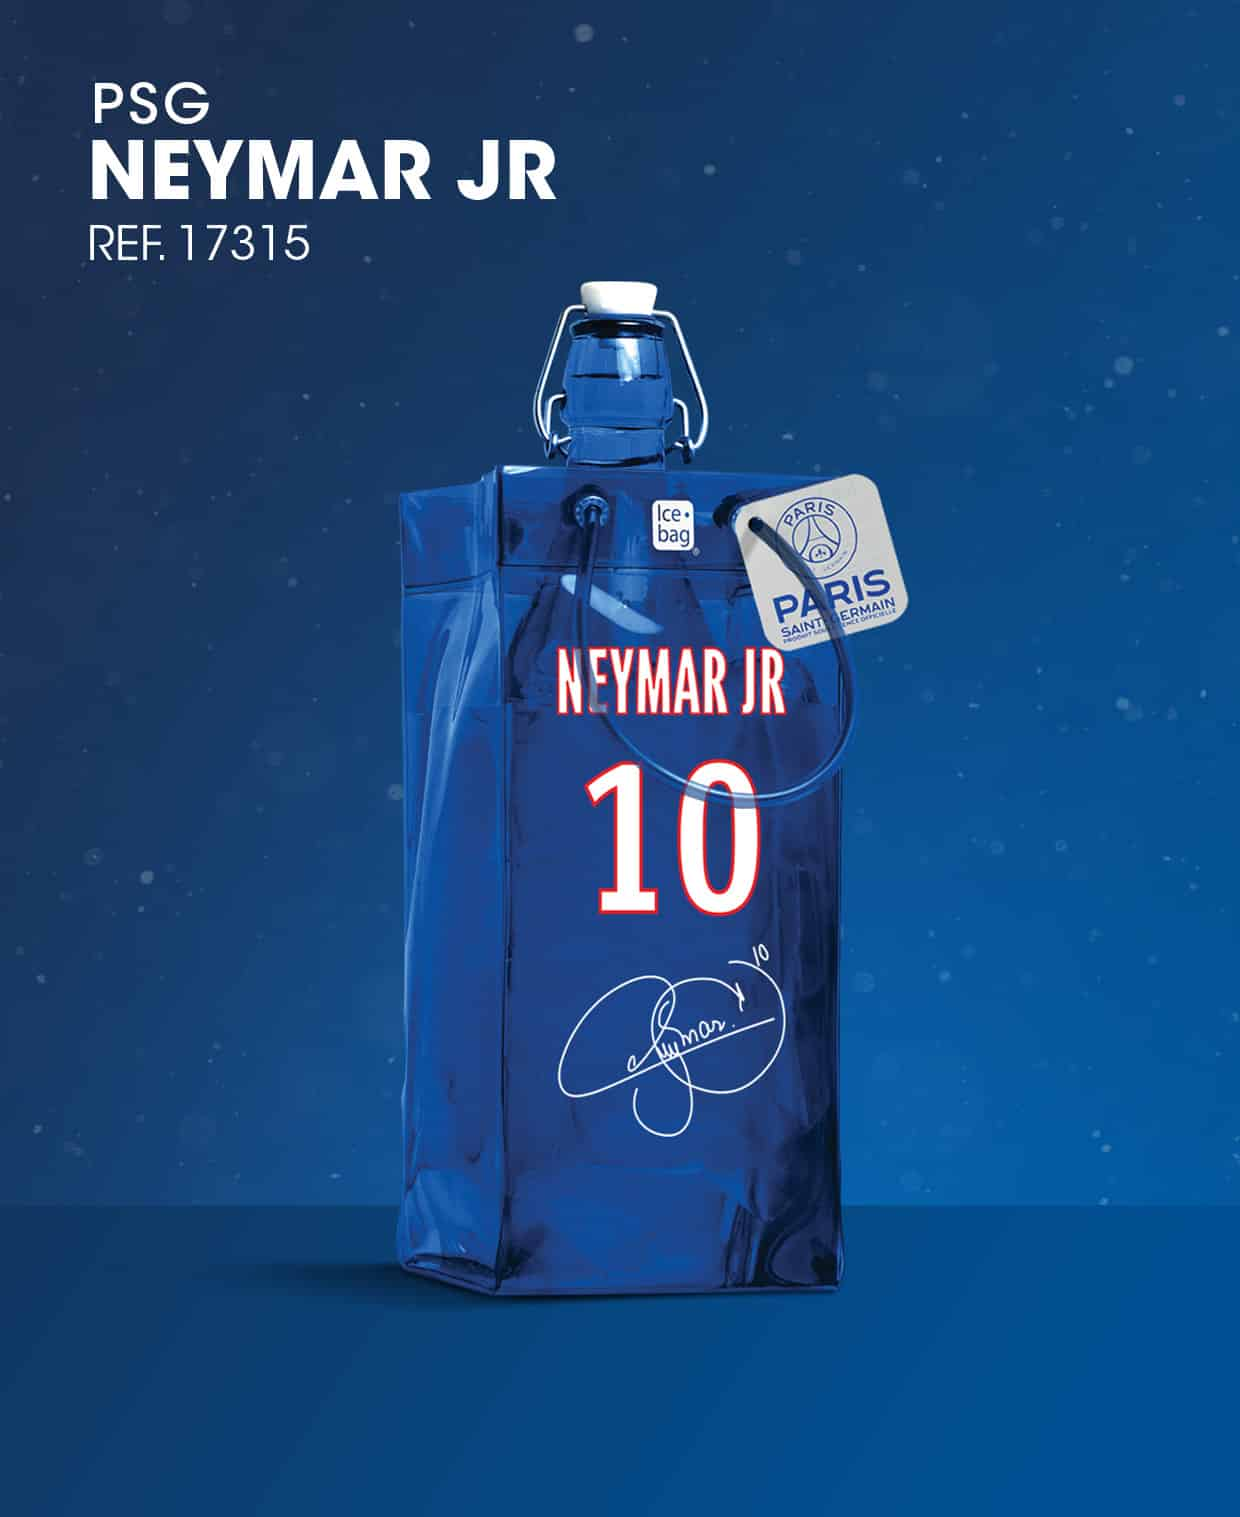 Sac à glaçon PSG Neymar Jr